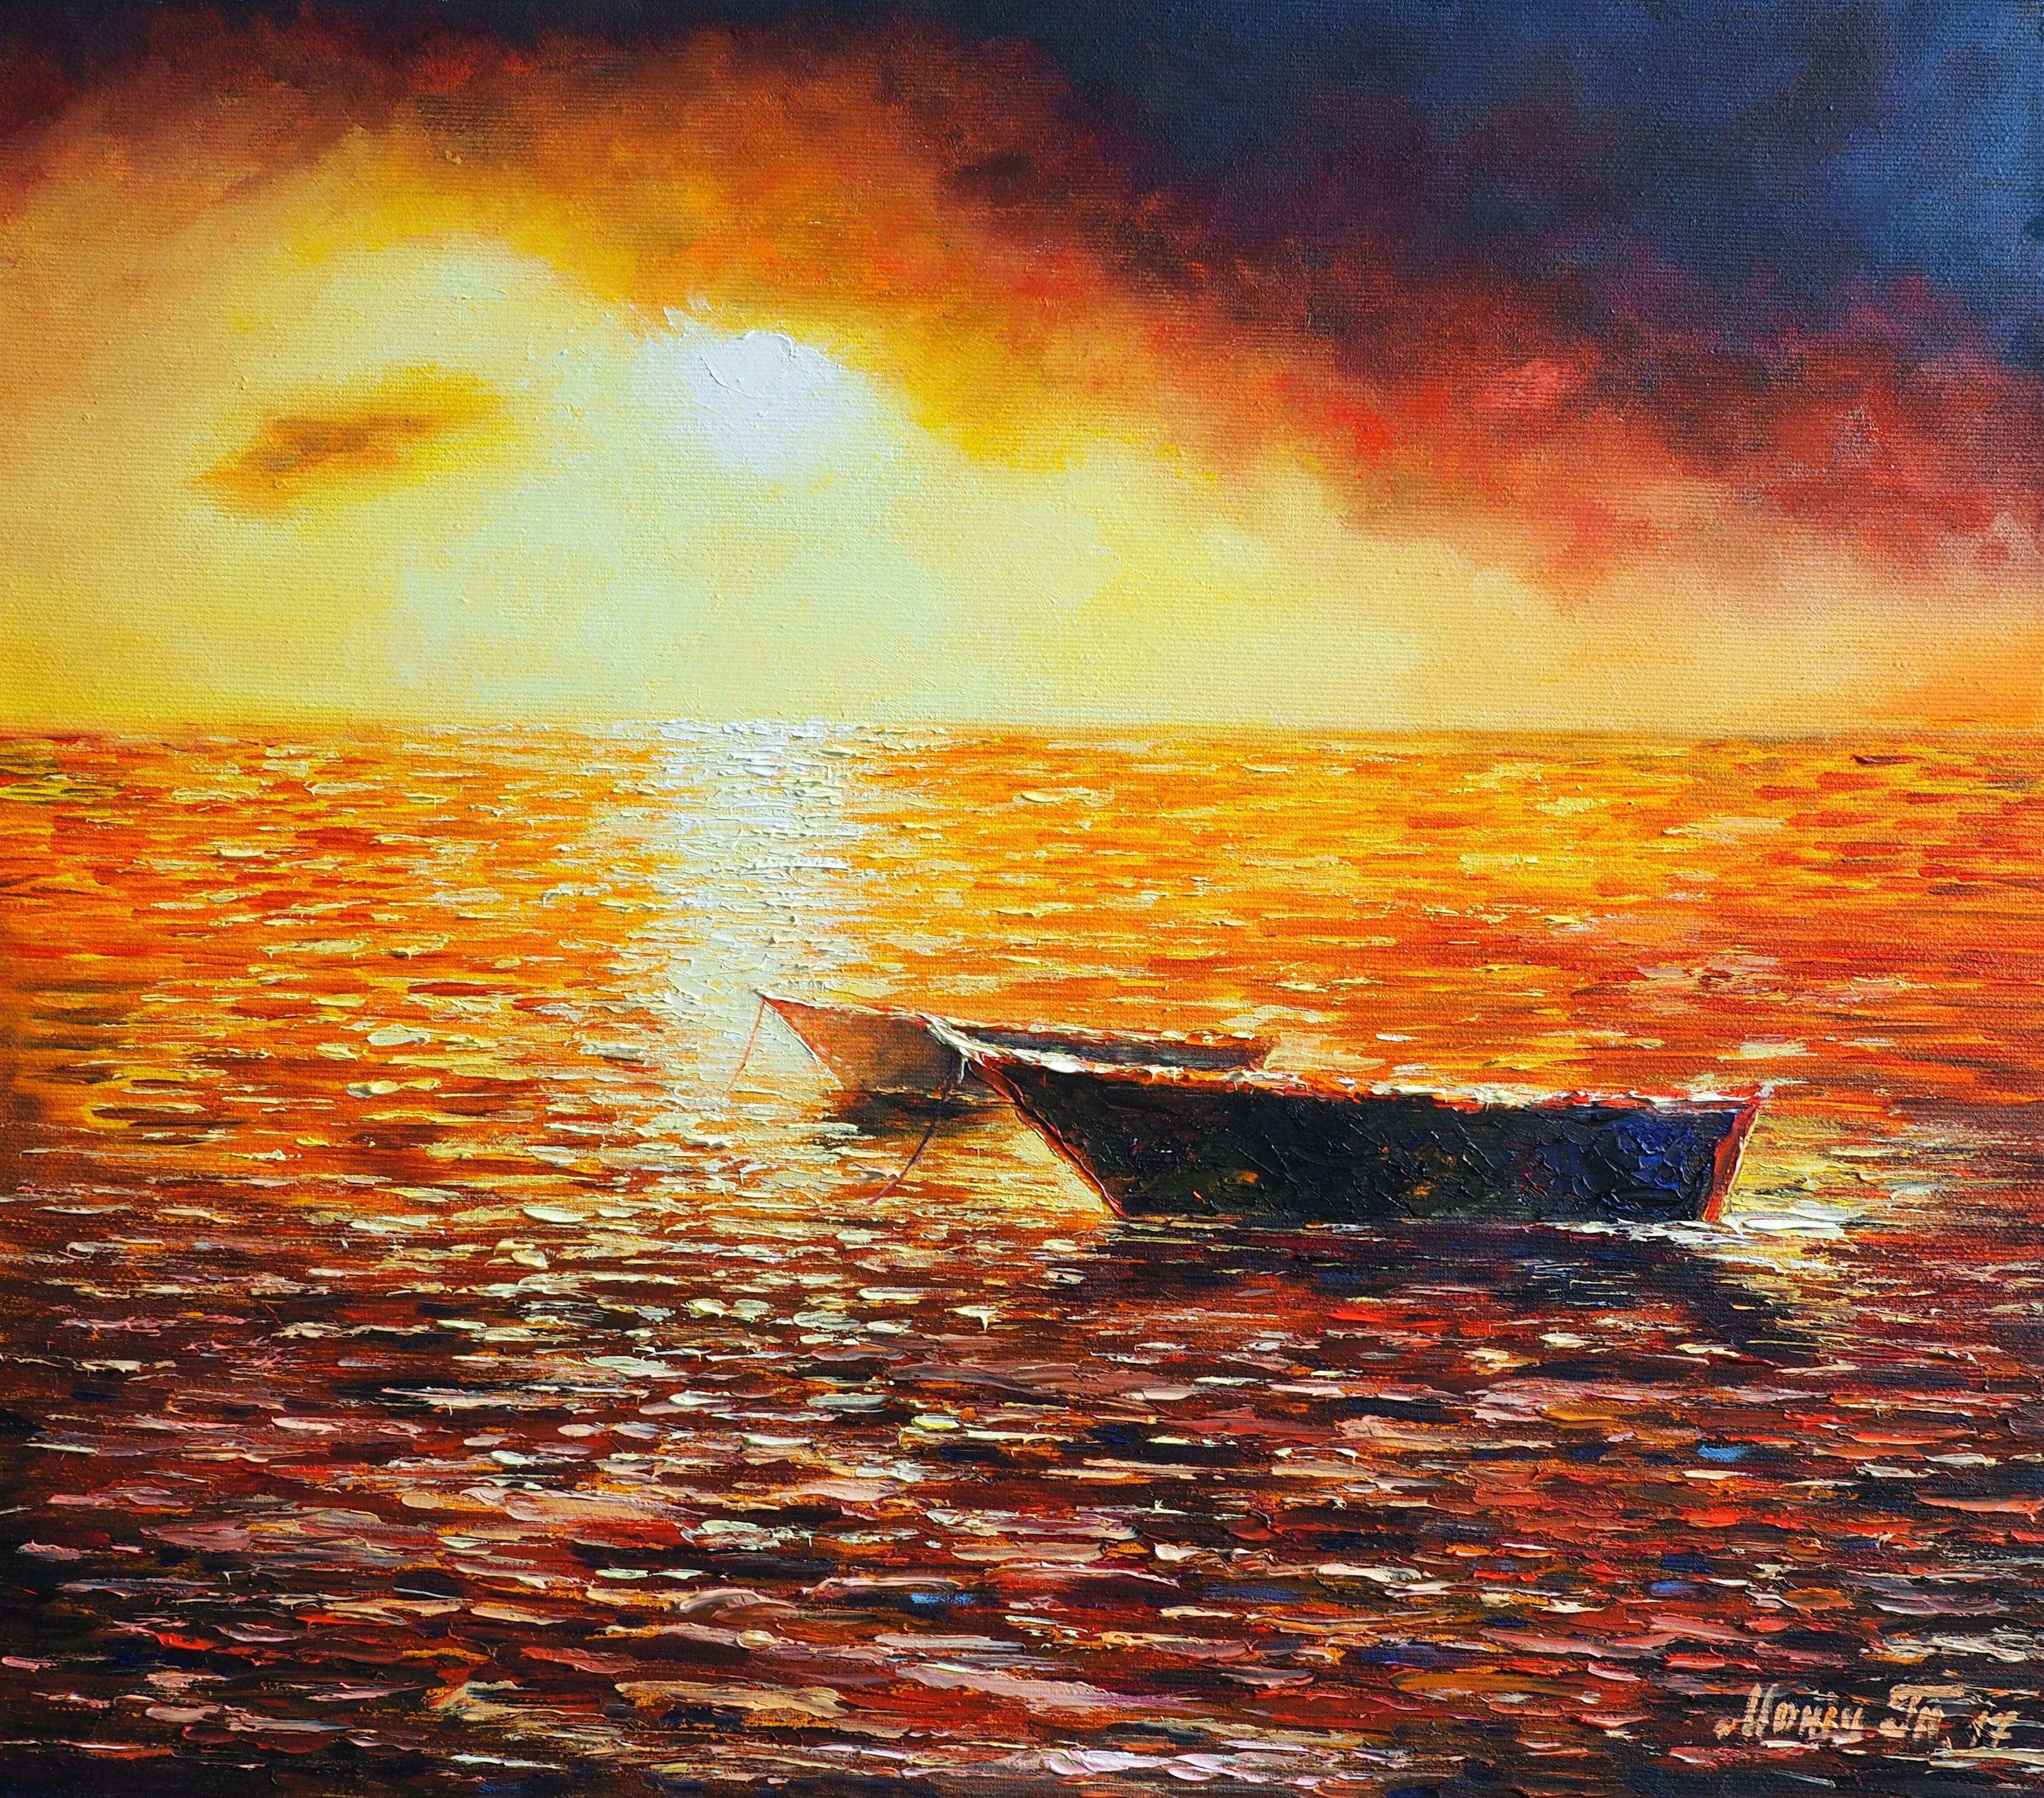 Watercolor Sunset Ocean Google Search Watercolor Sunset